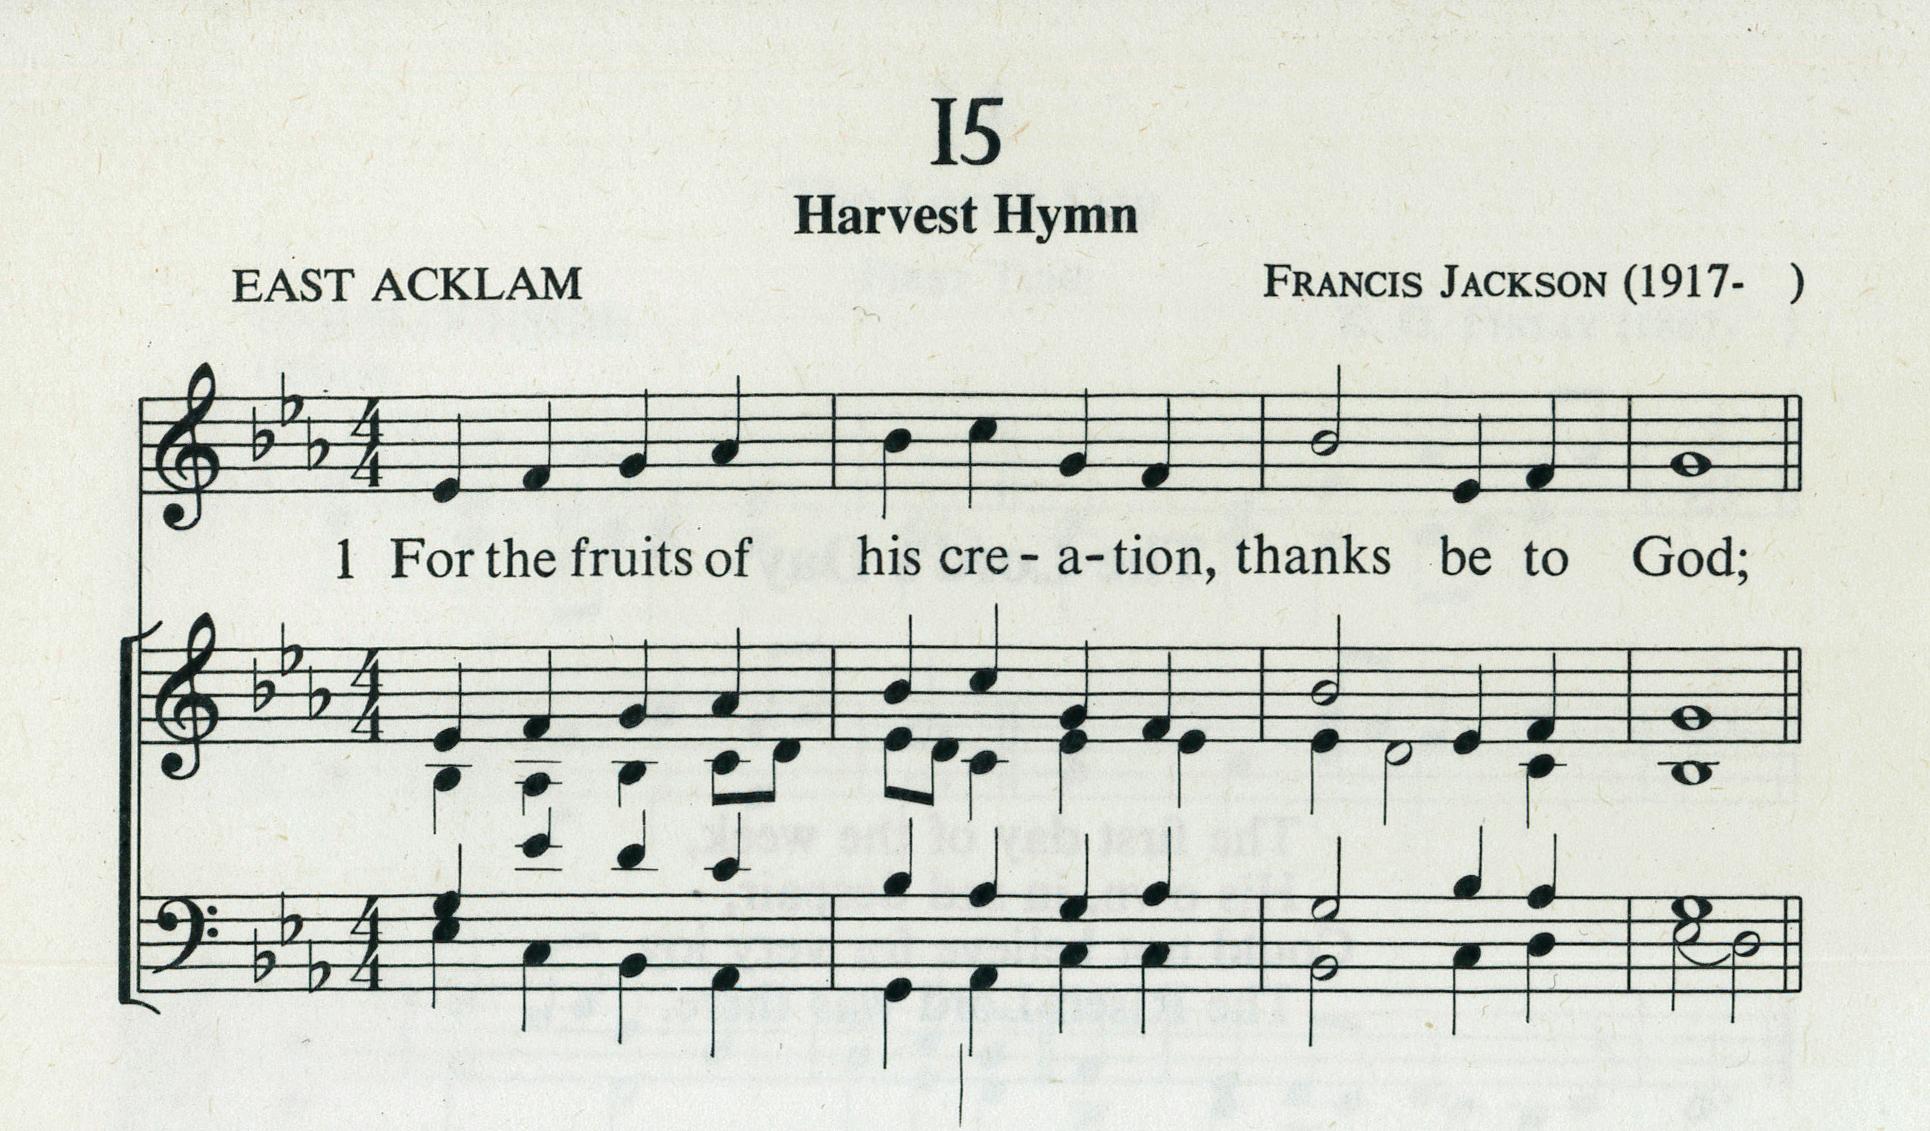 Fig. 3.  Fred Pratt Green,  26 Hymns  (London: Epworth, 1971), excerpt. Text ©1970 Hope Publishing Co., tune ©1960 Francis Jackson.